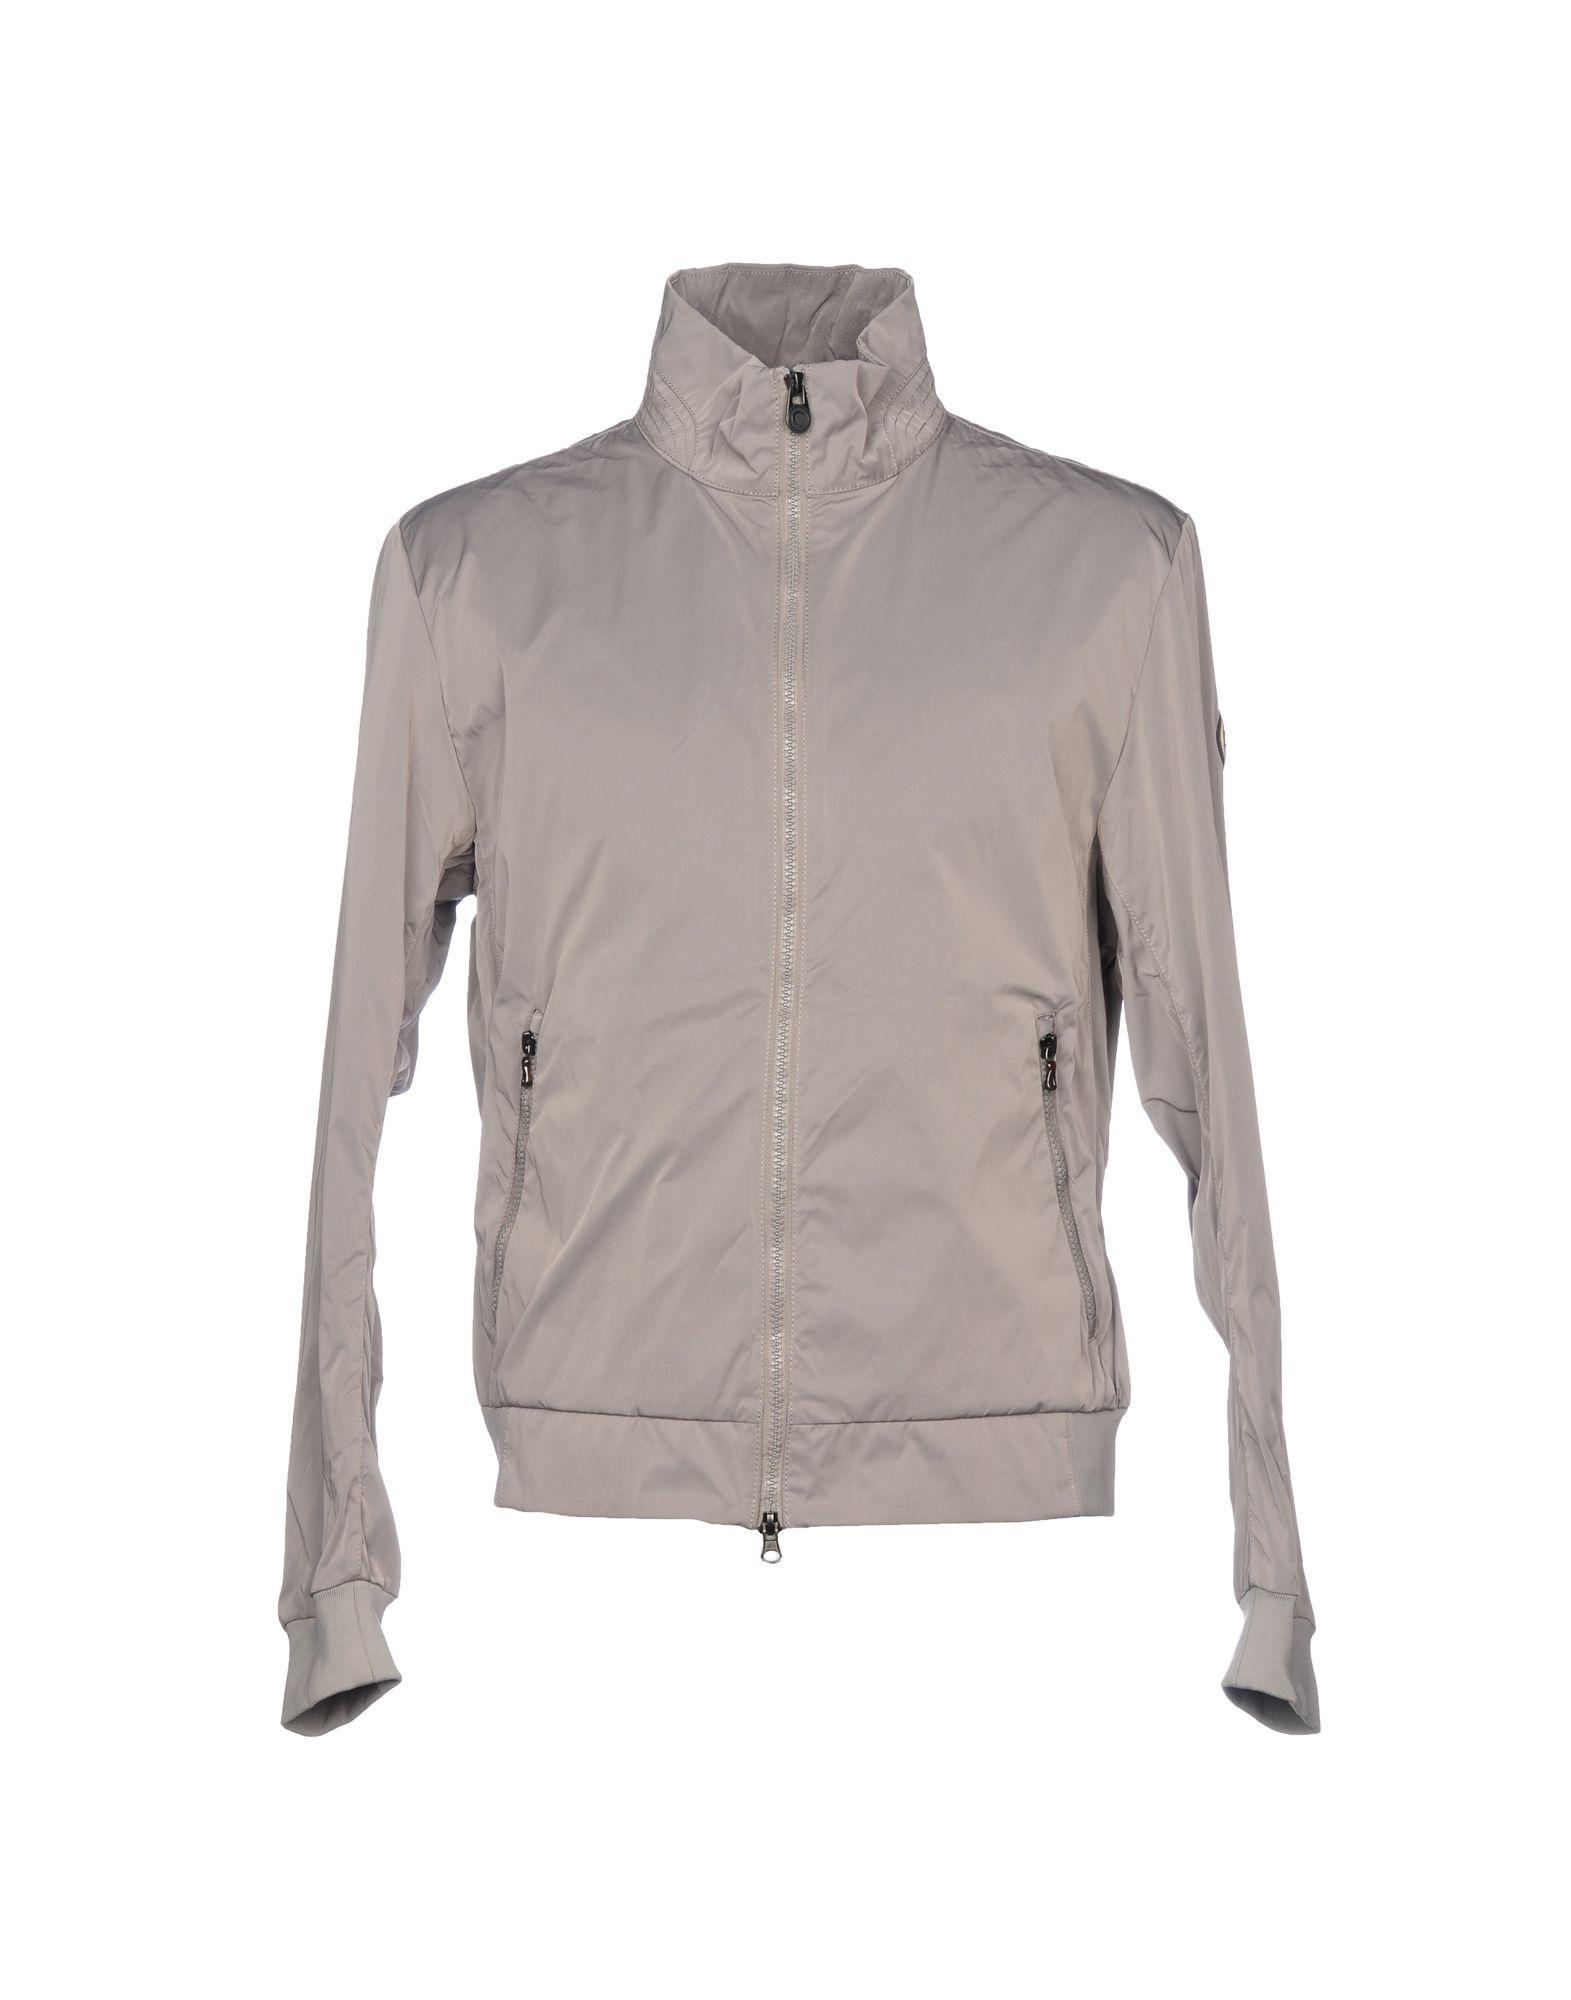 Colmar Jackets In Khaki